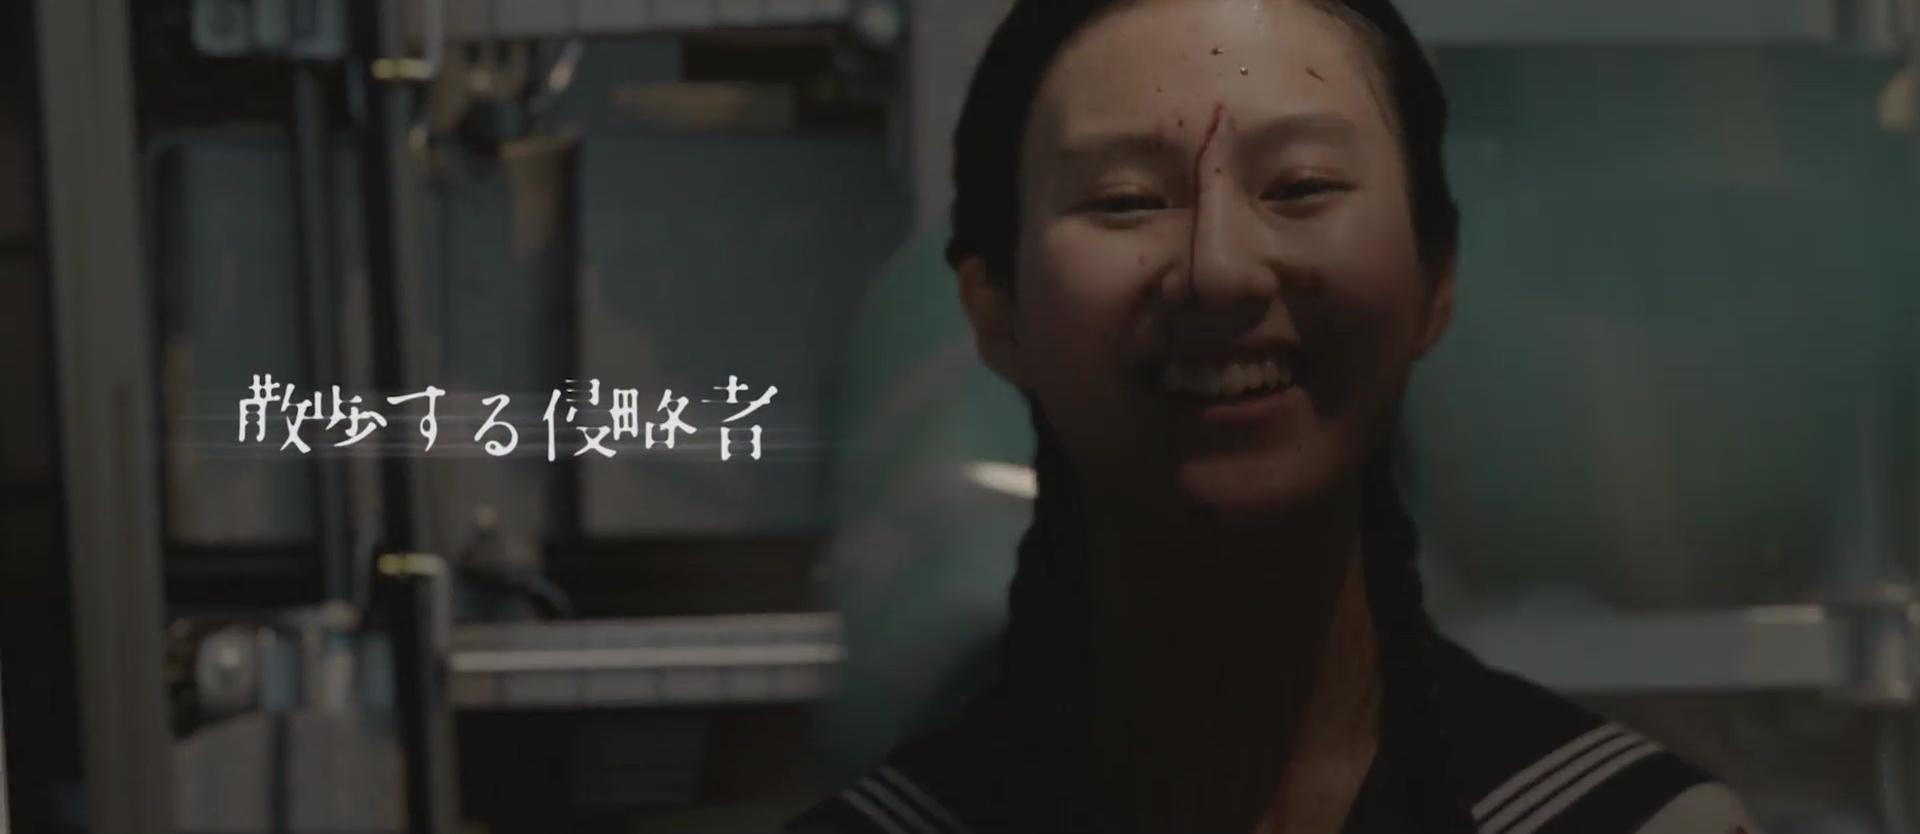 AVANT QUE NOUS DISPARAISSIONS (散歩する侵略者) de Kurosawa Kiyoshi (2017)